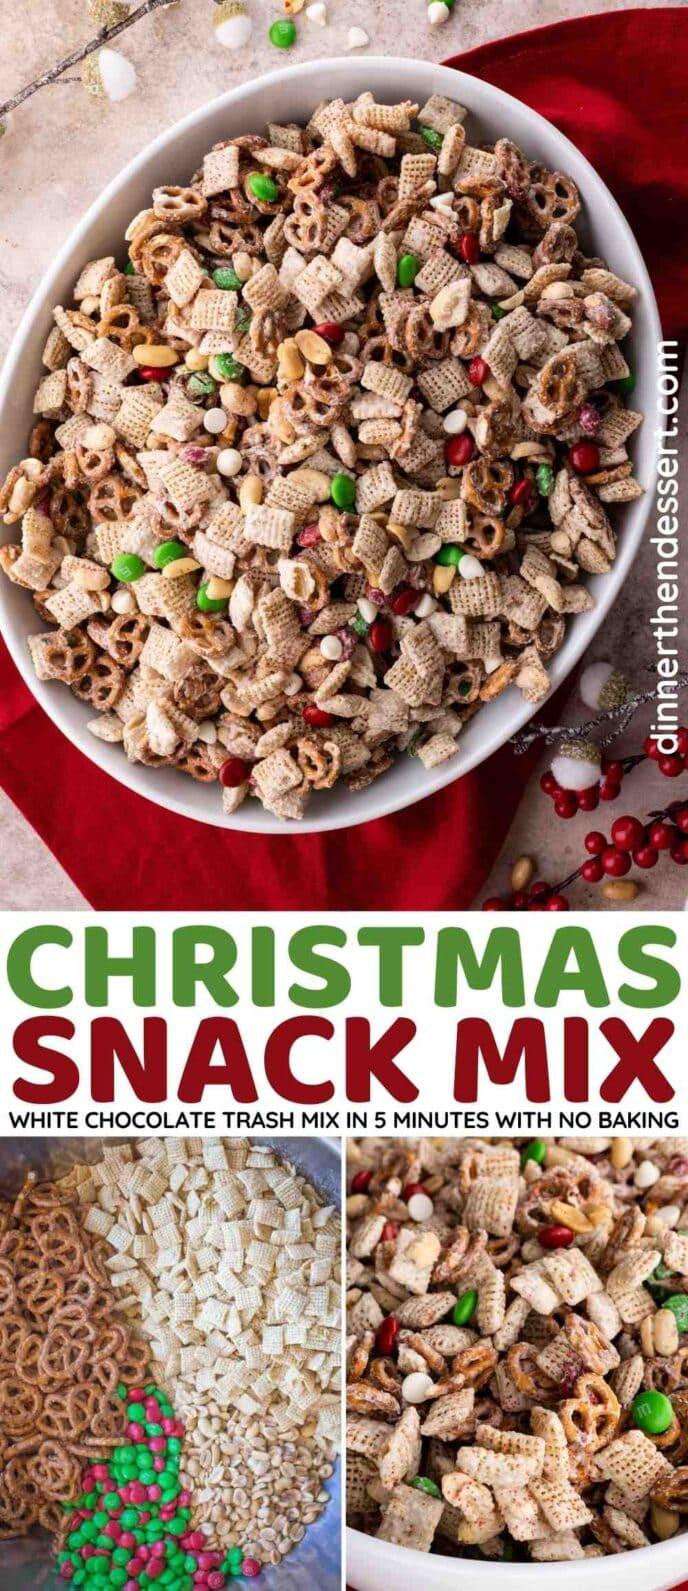 Christmas White Chocolate Trash Mix Collage